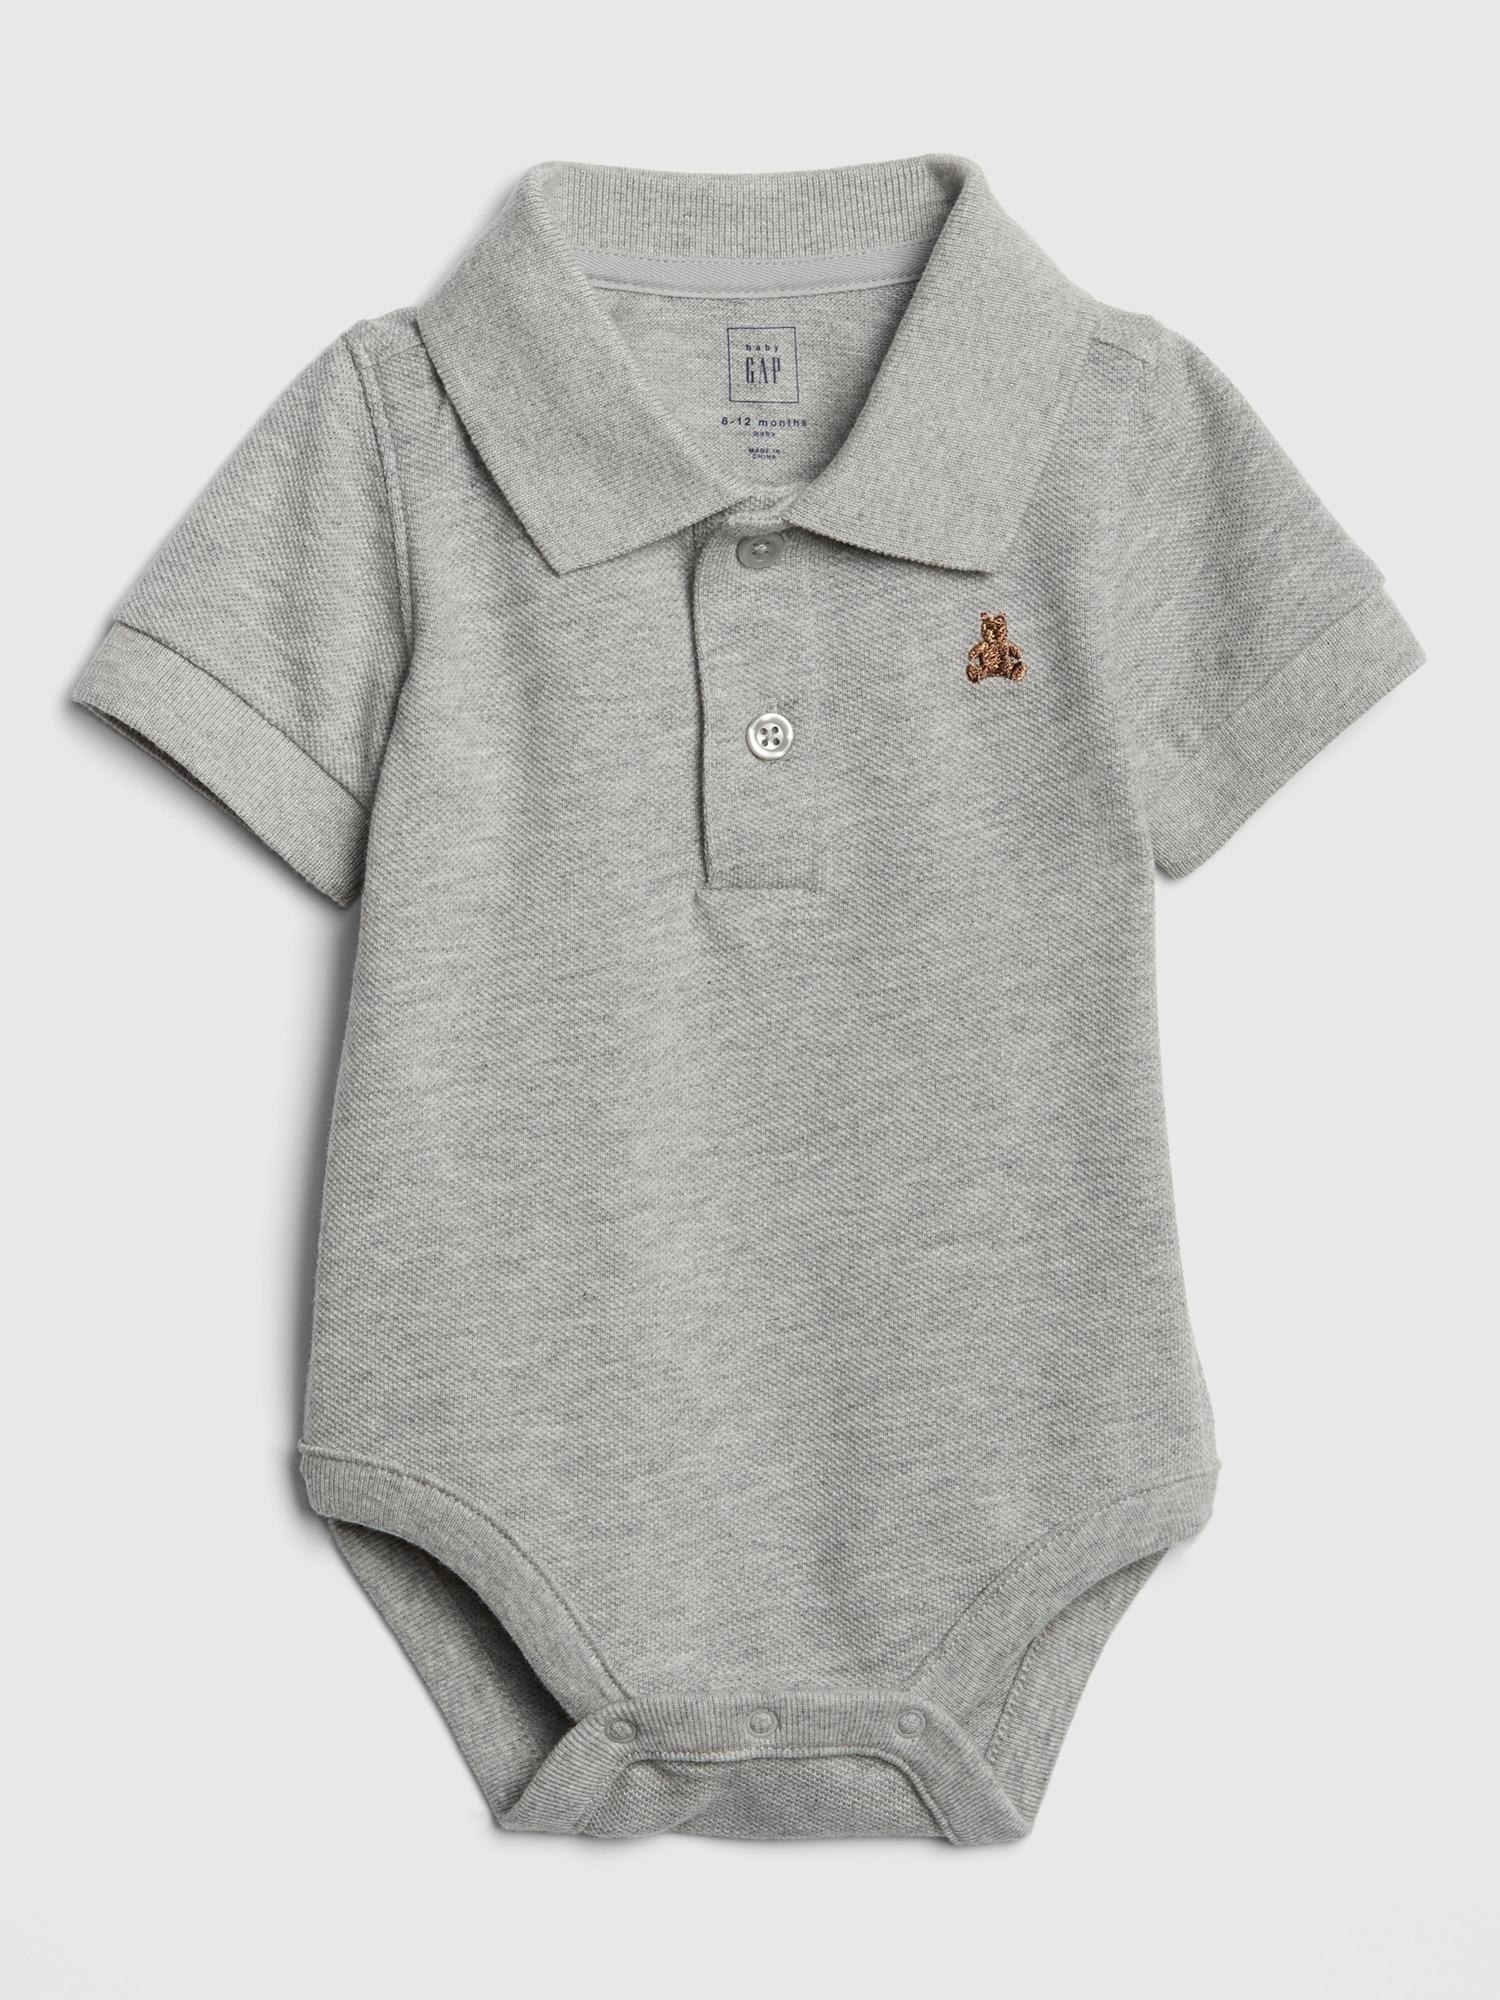 a3b21153 Polo Short Sleeve Bodysuit | Gap